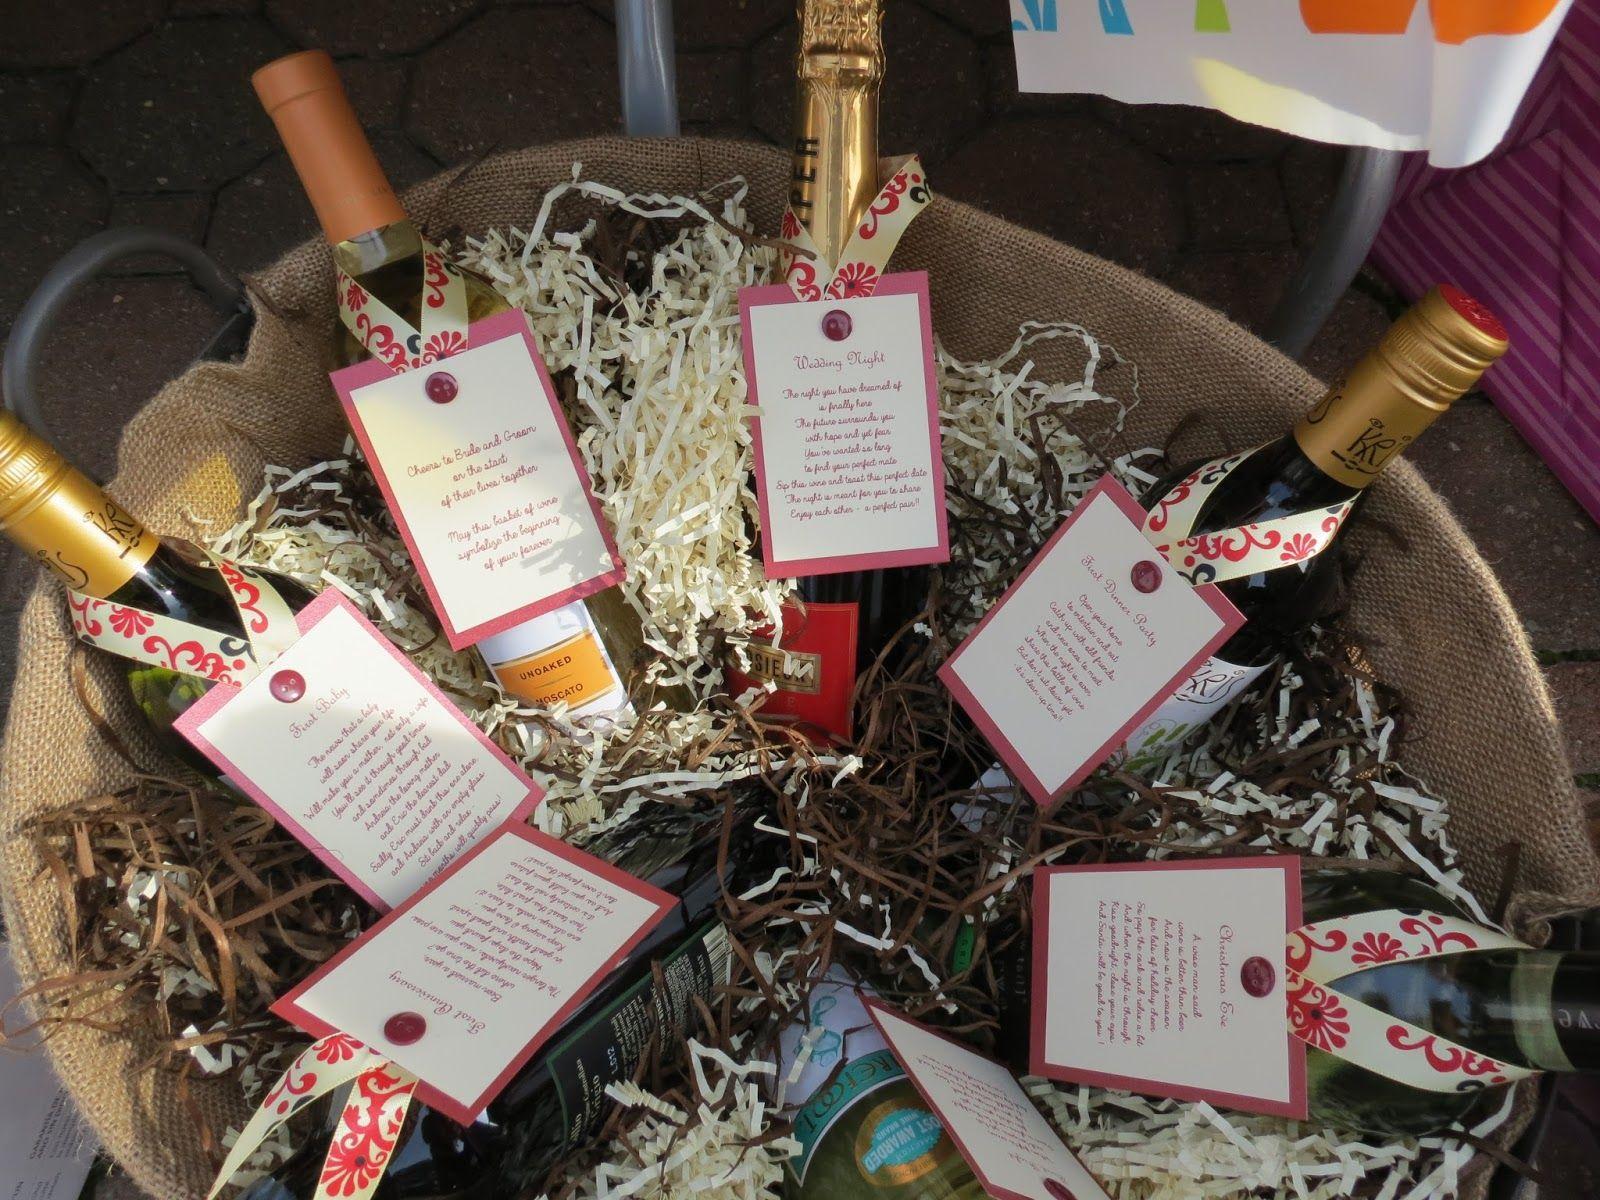 Wine Tags For Poem Basket Bridal Shower Perfect Gift Designed By Dani Alcantara